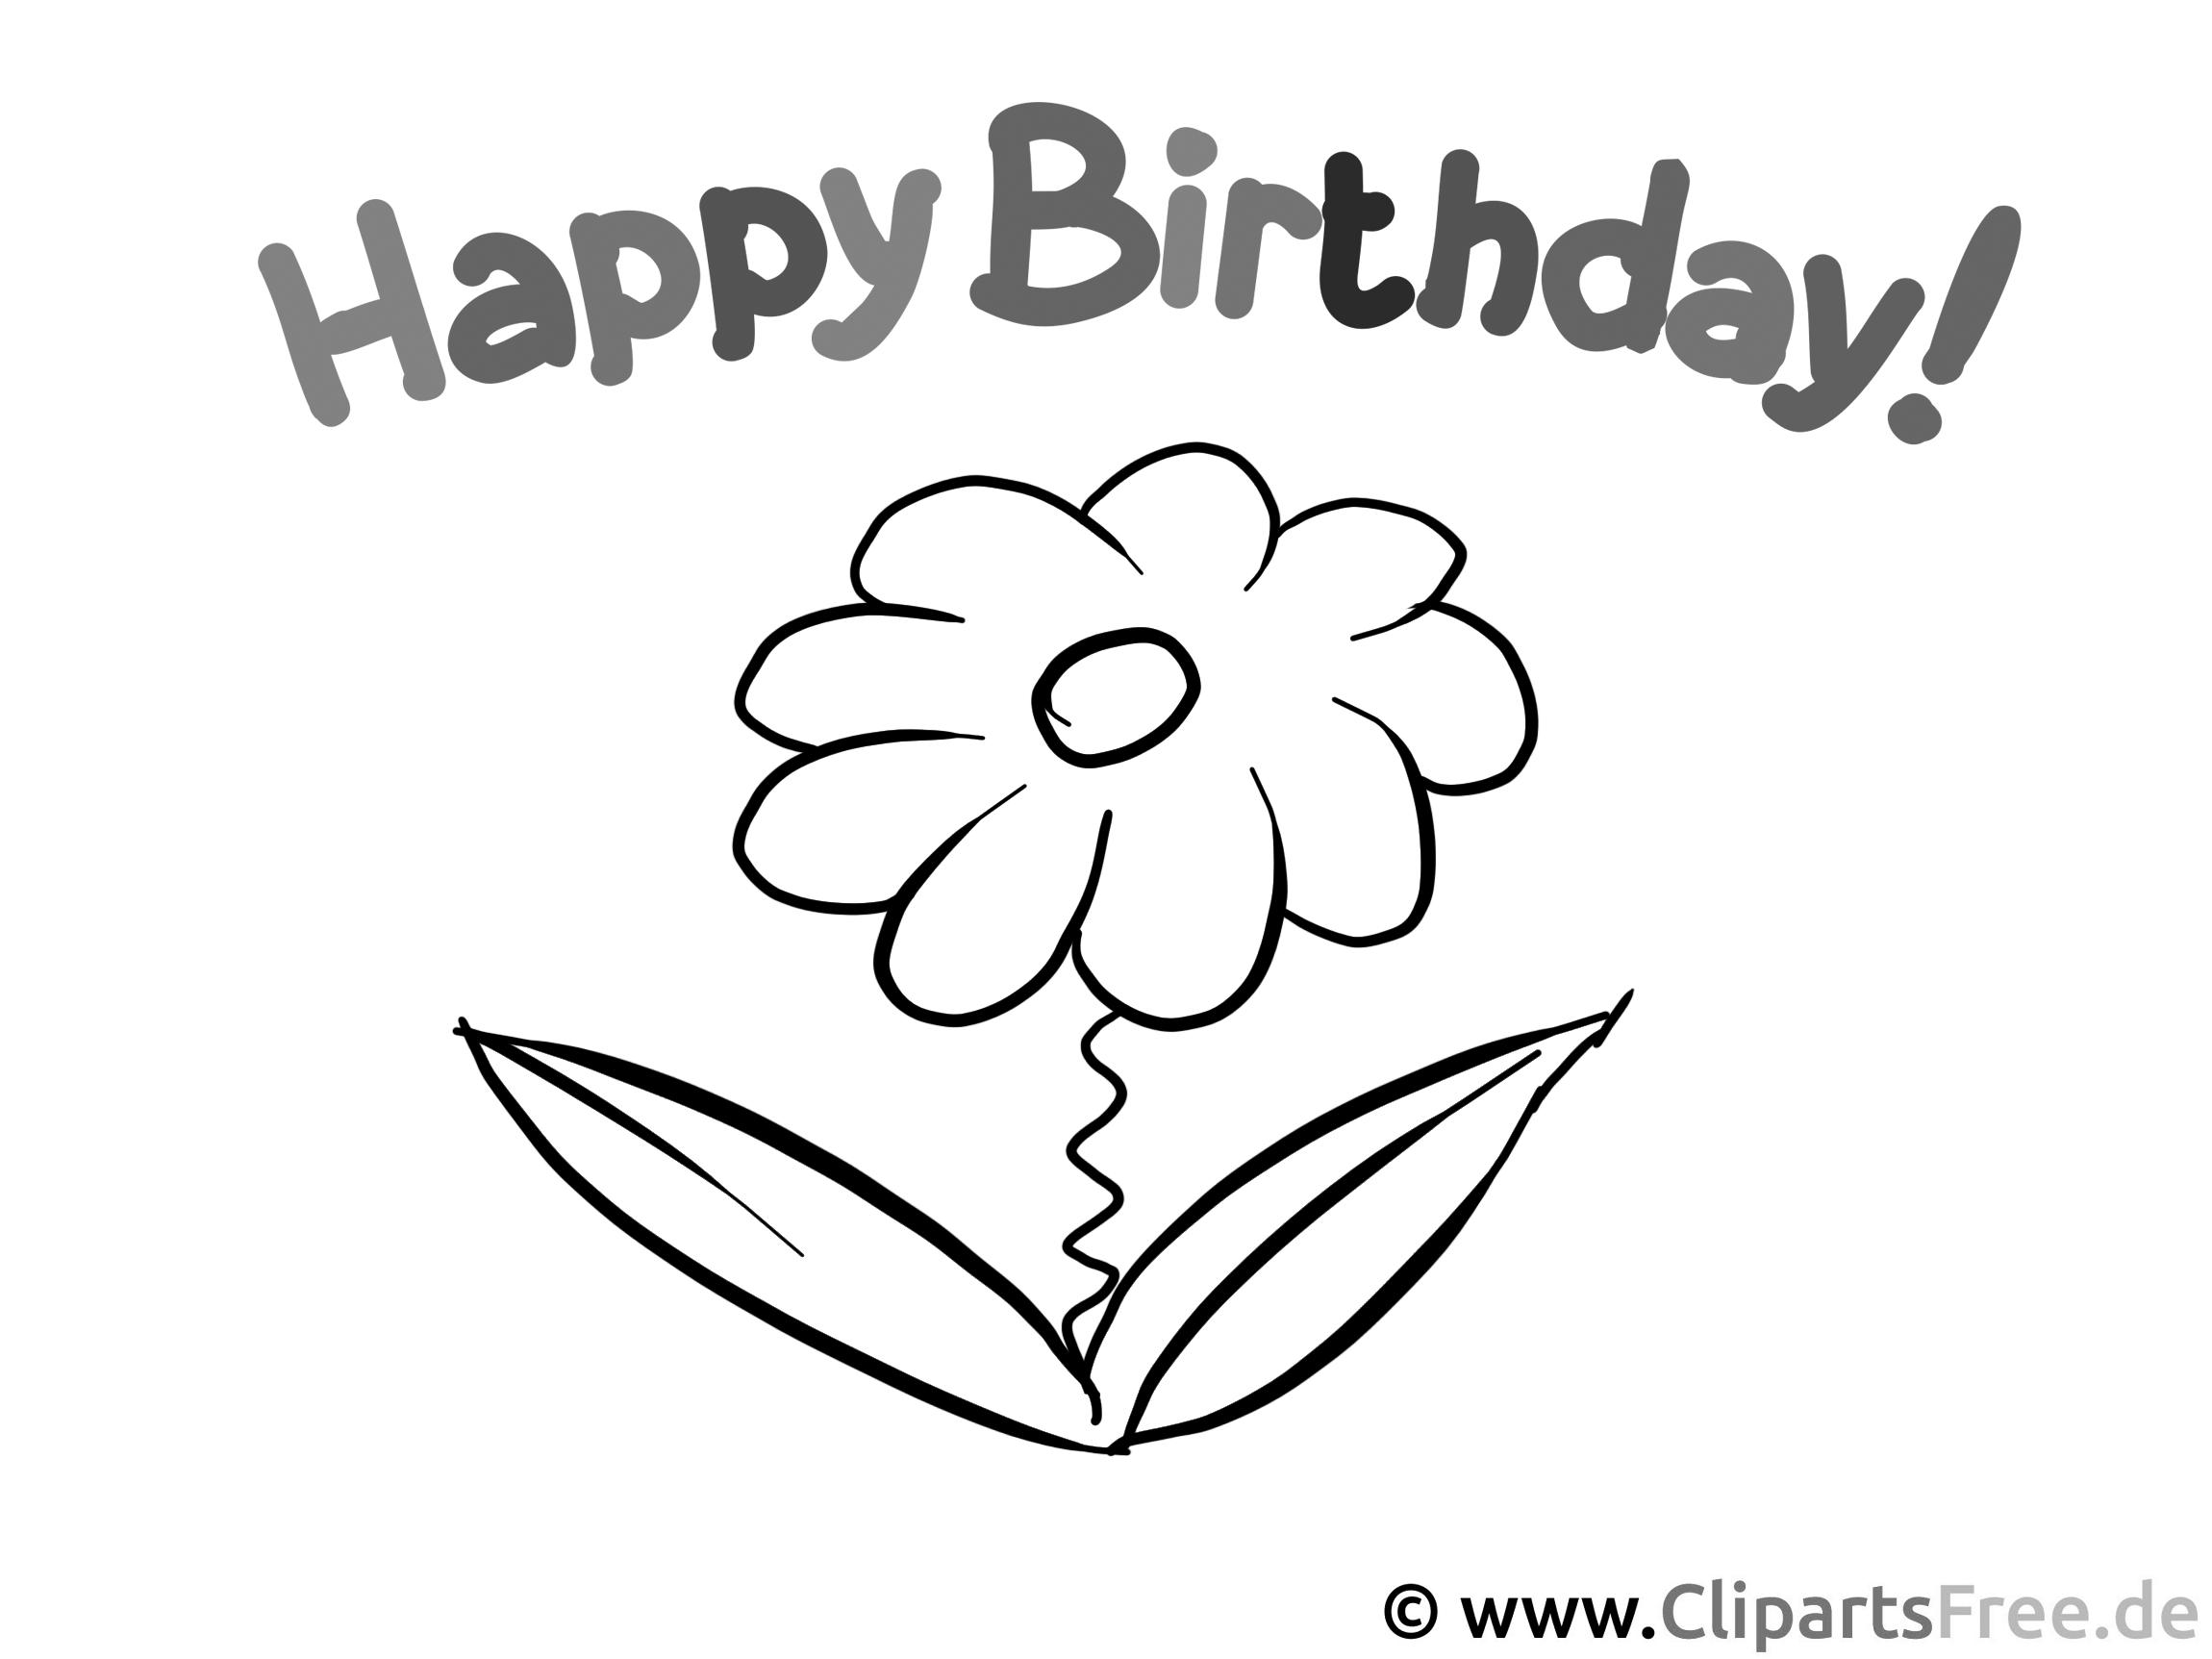 Malvorlagen Happy Birthday  Coloring and Malvorlagan